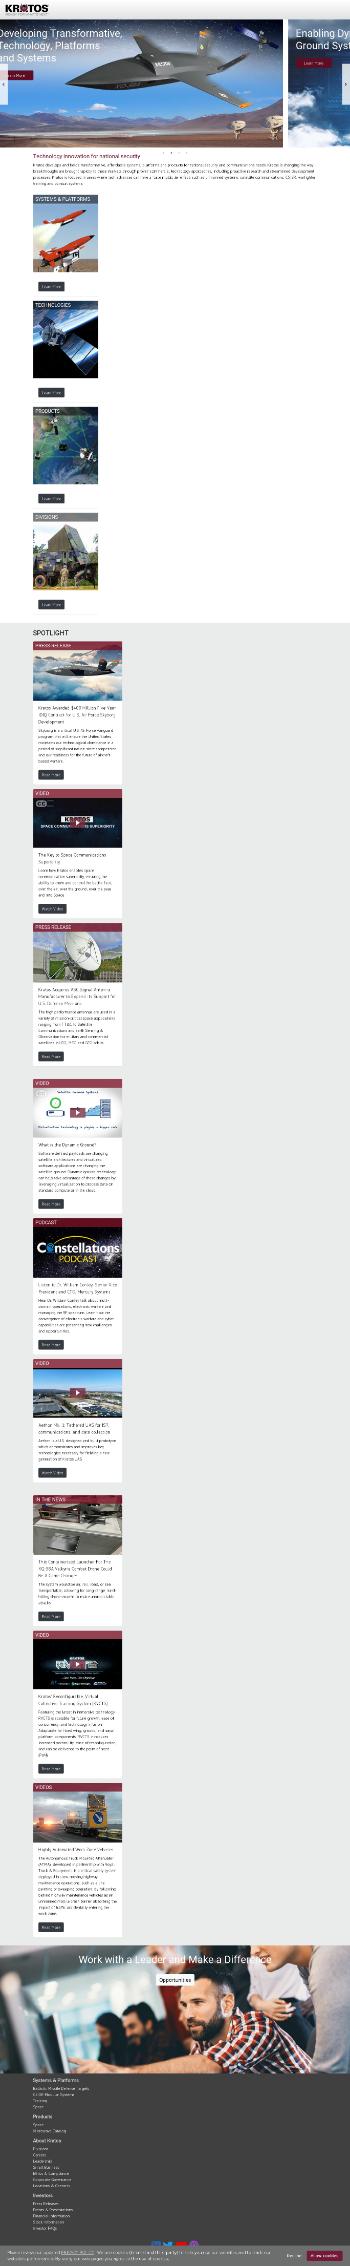 Kratos Defense & Security Solutions, Inc. Website Screenshot